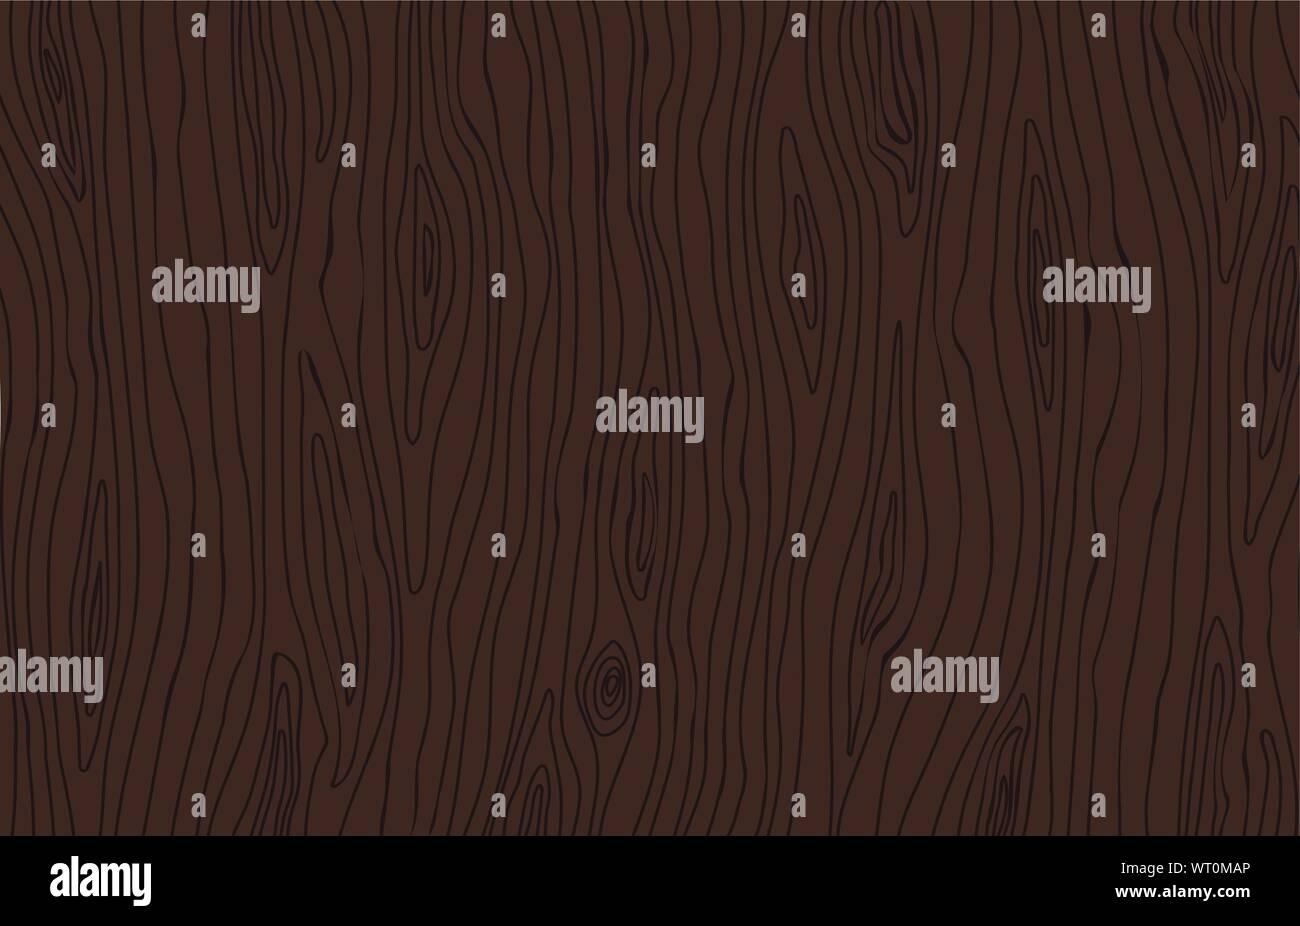 Walnut Veneer Texture Stock Photos Walnut Veneer Texture